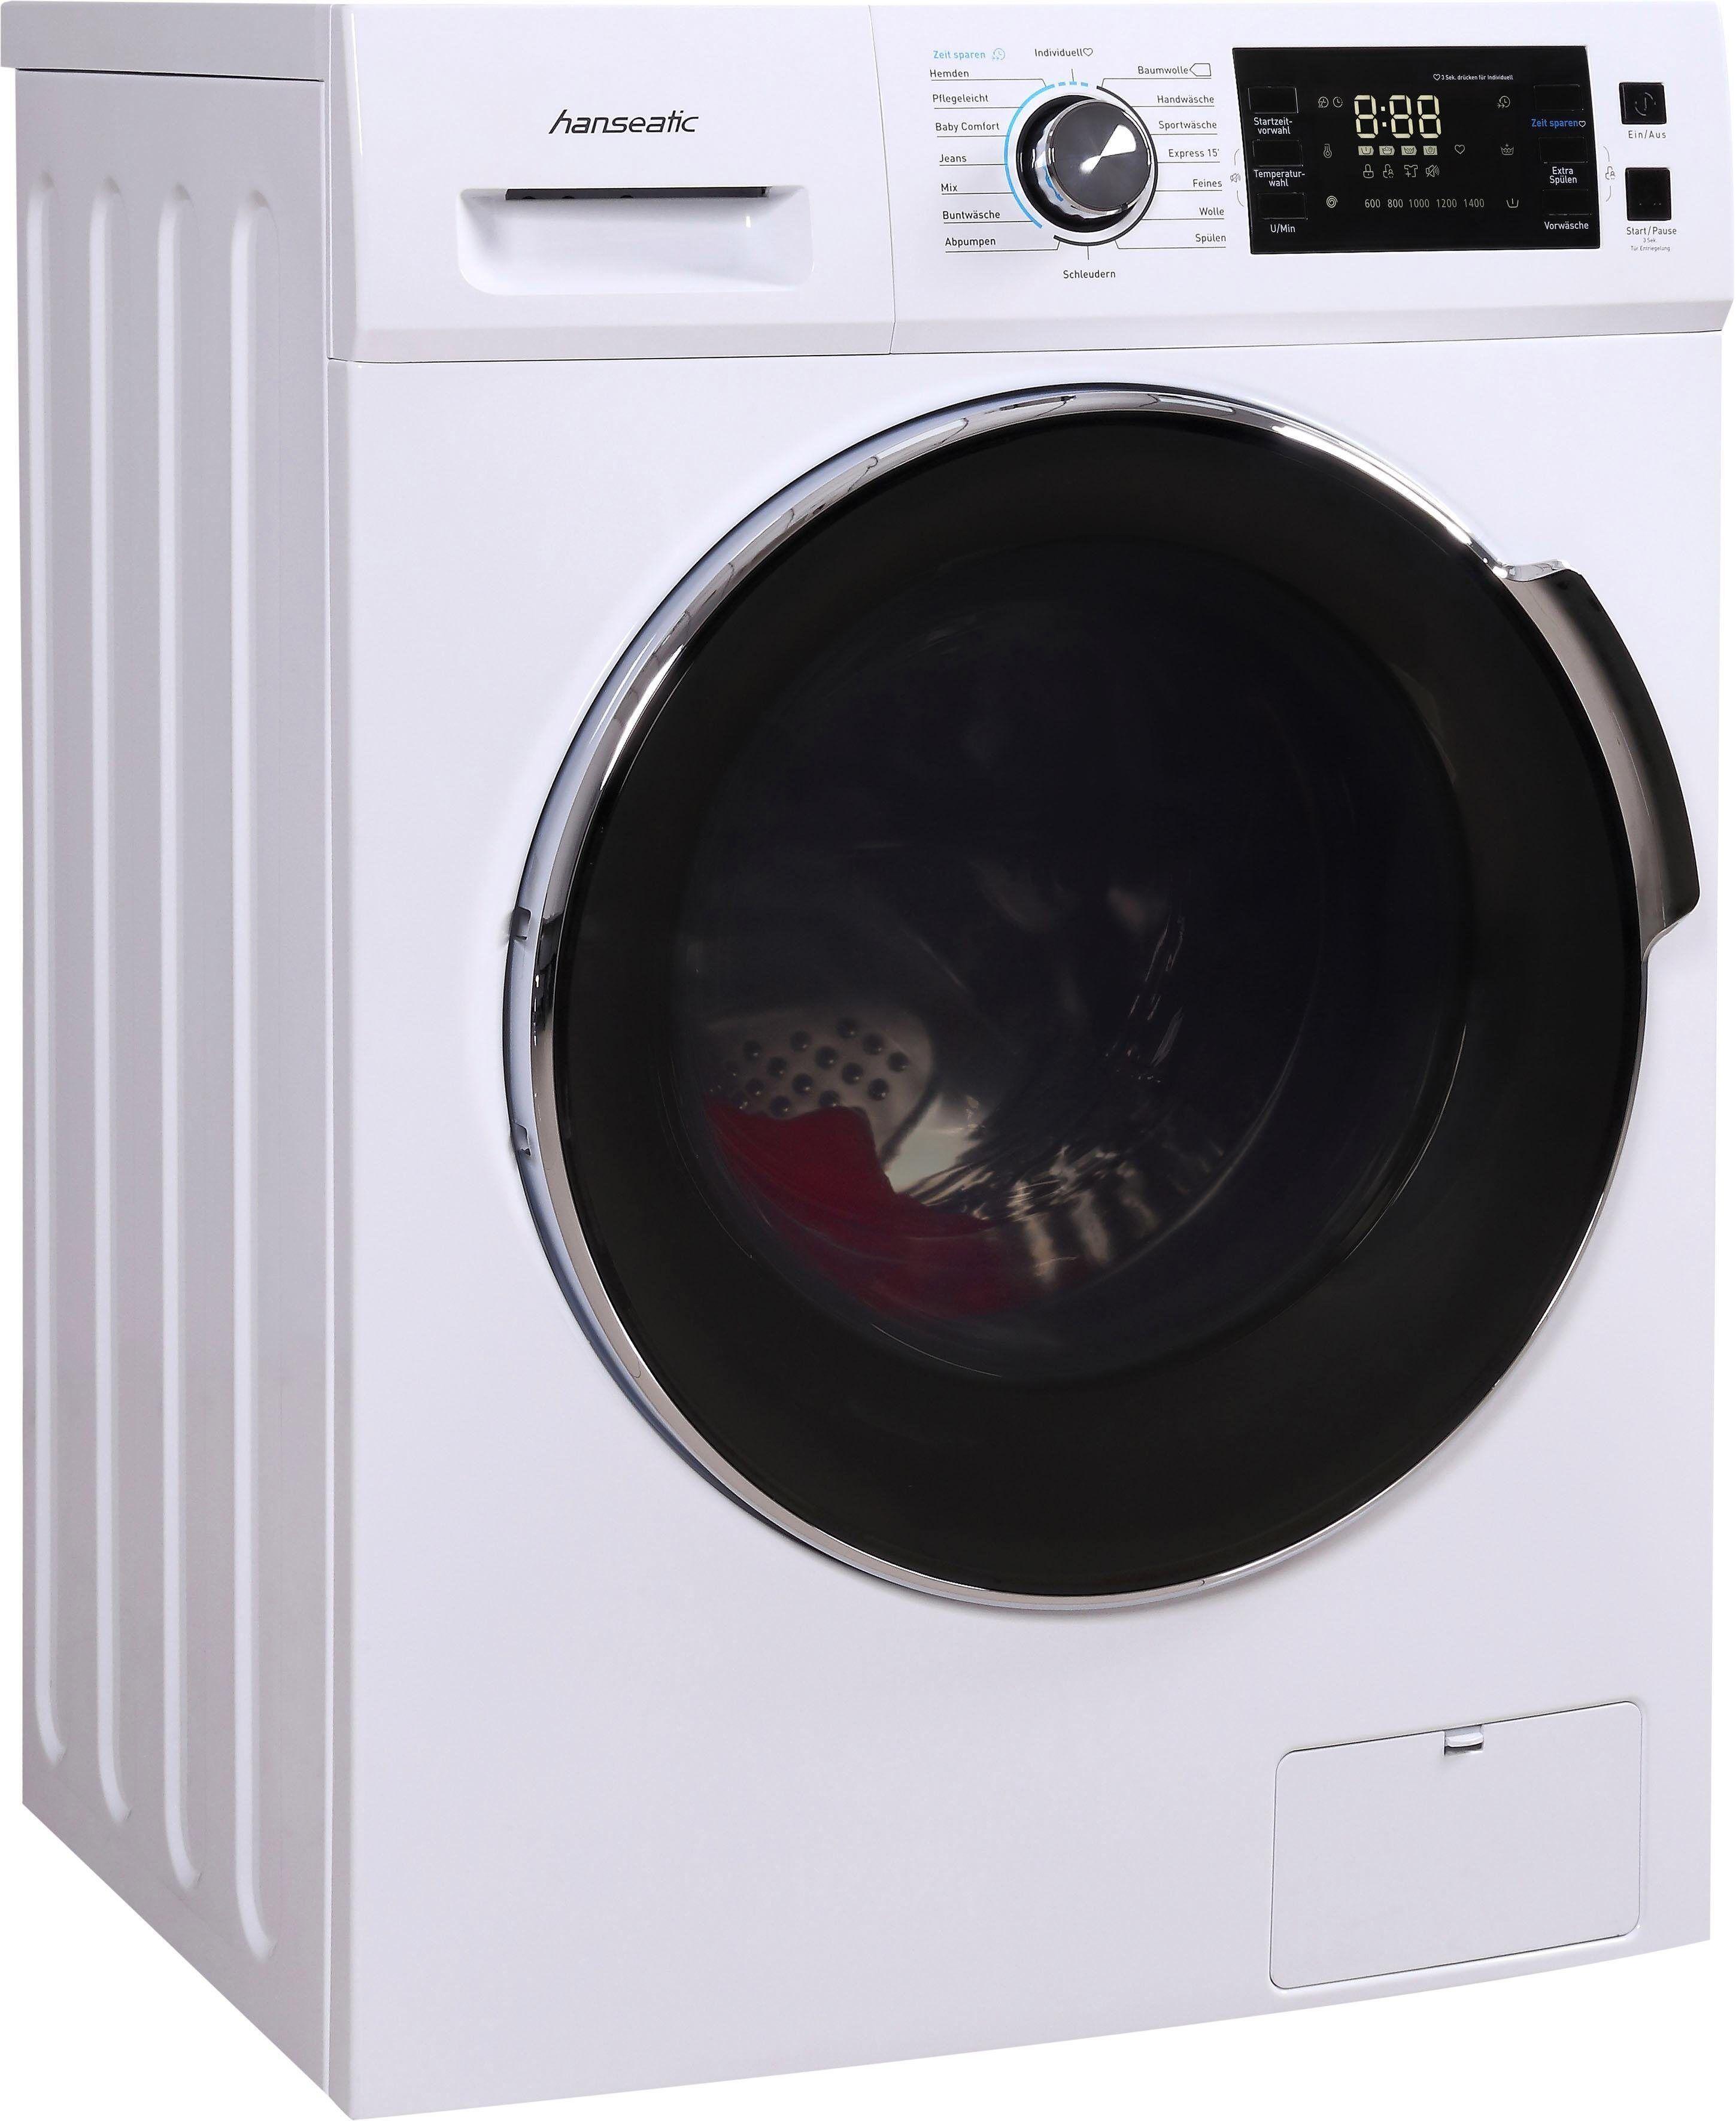 Hanseatic Waschmaschine HWMB814A3, 8 kg, 1400 U/Min, Energieeffizienzklasse A+++